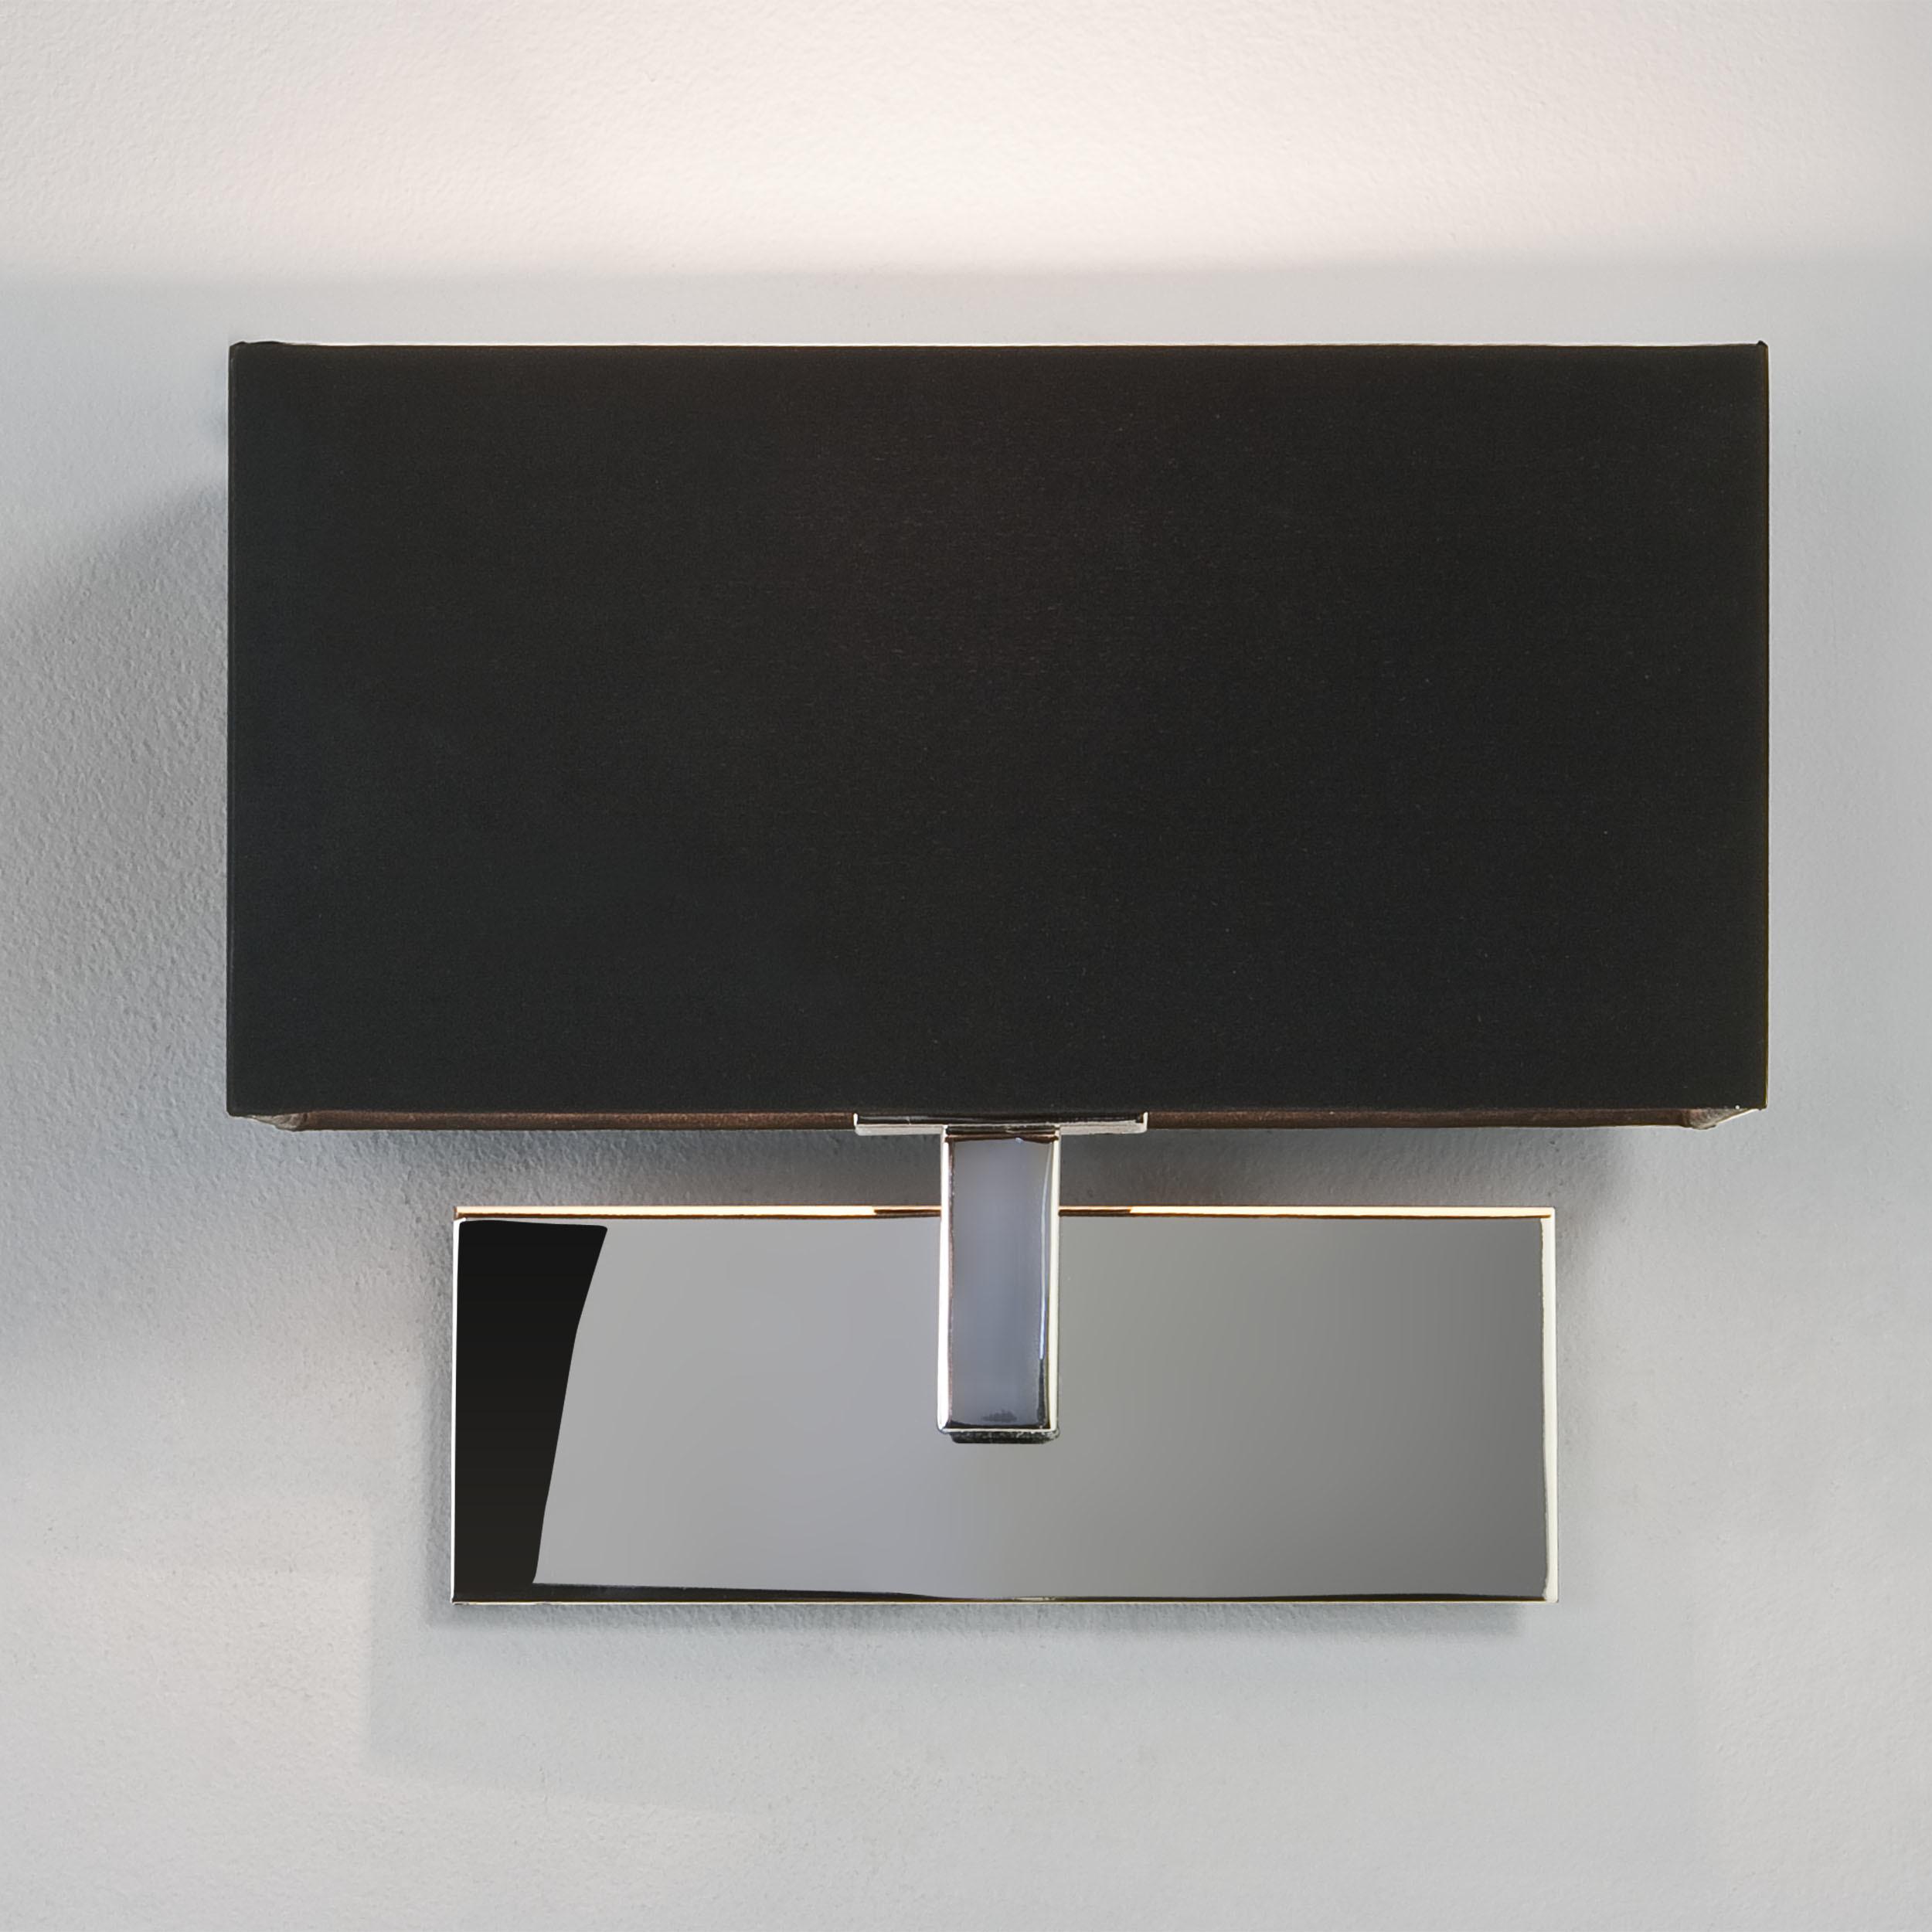 Бра Astro Park Lane 1080002 (516), 1xE14x60W, хром, черный, металл, текстиль - фото 1